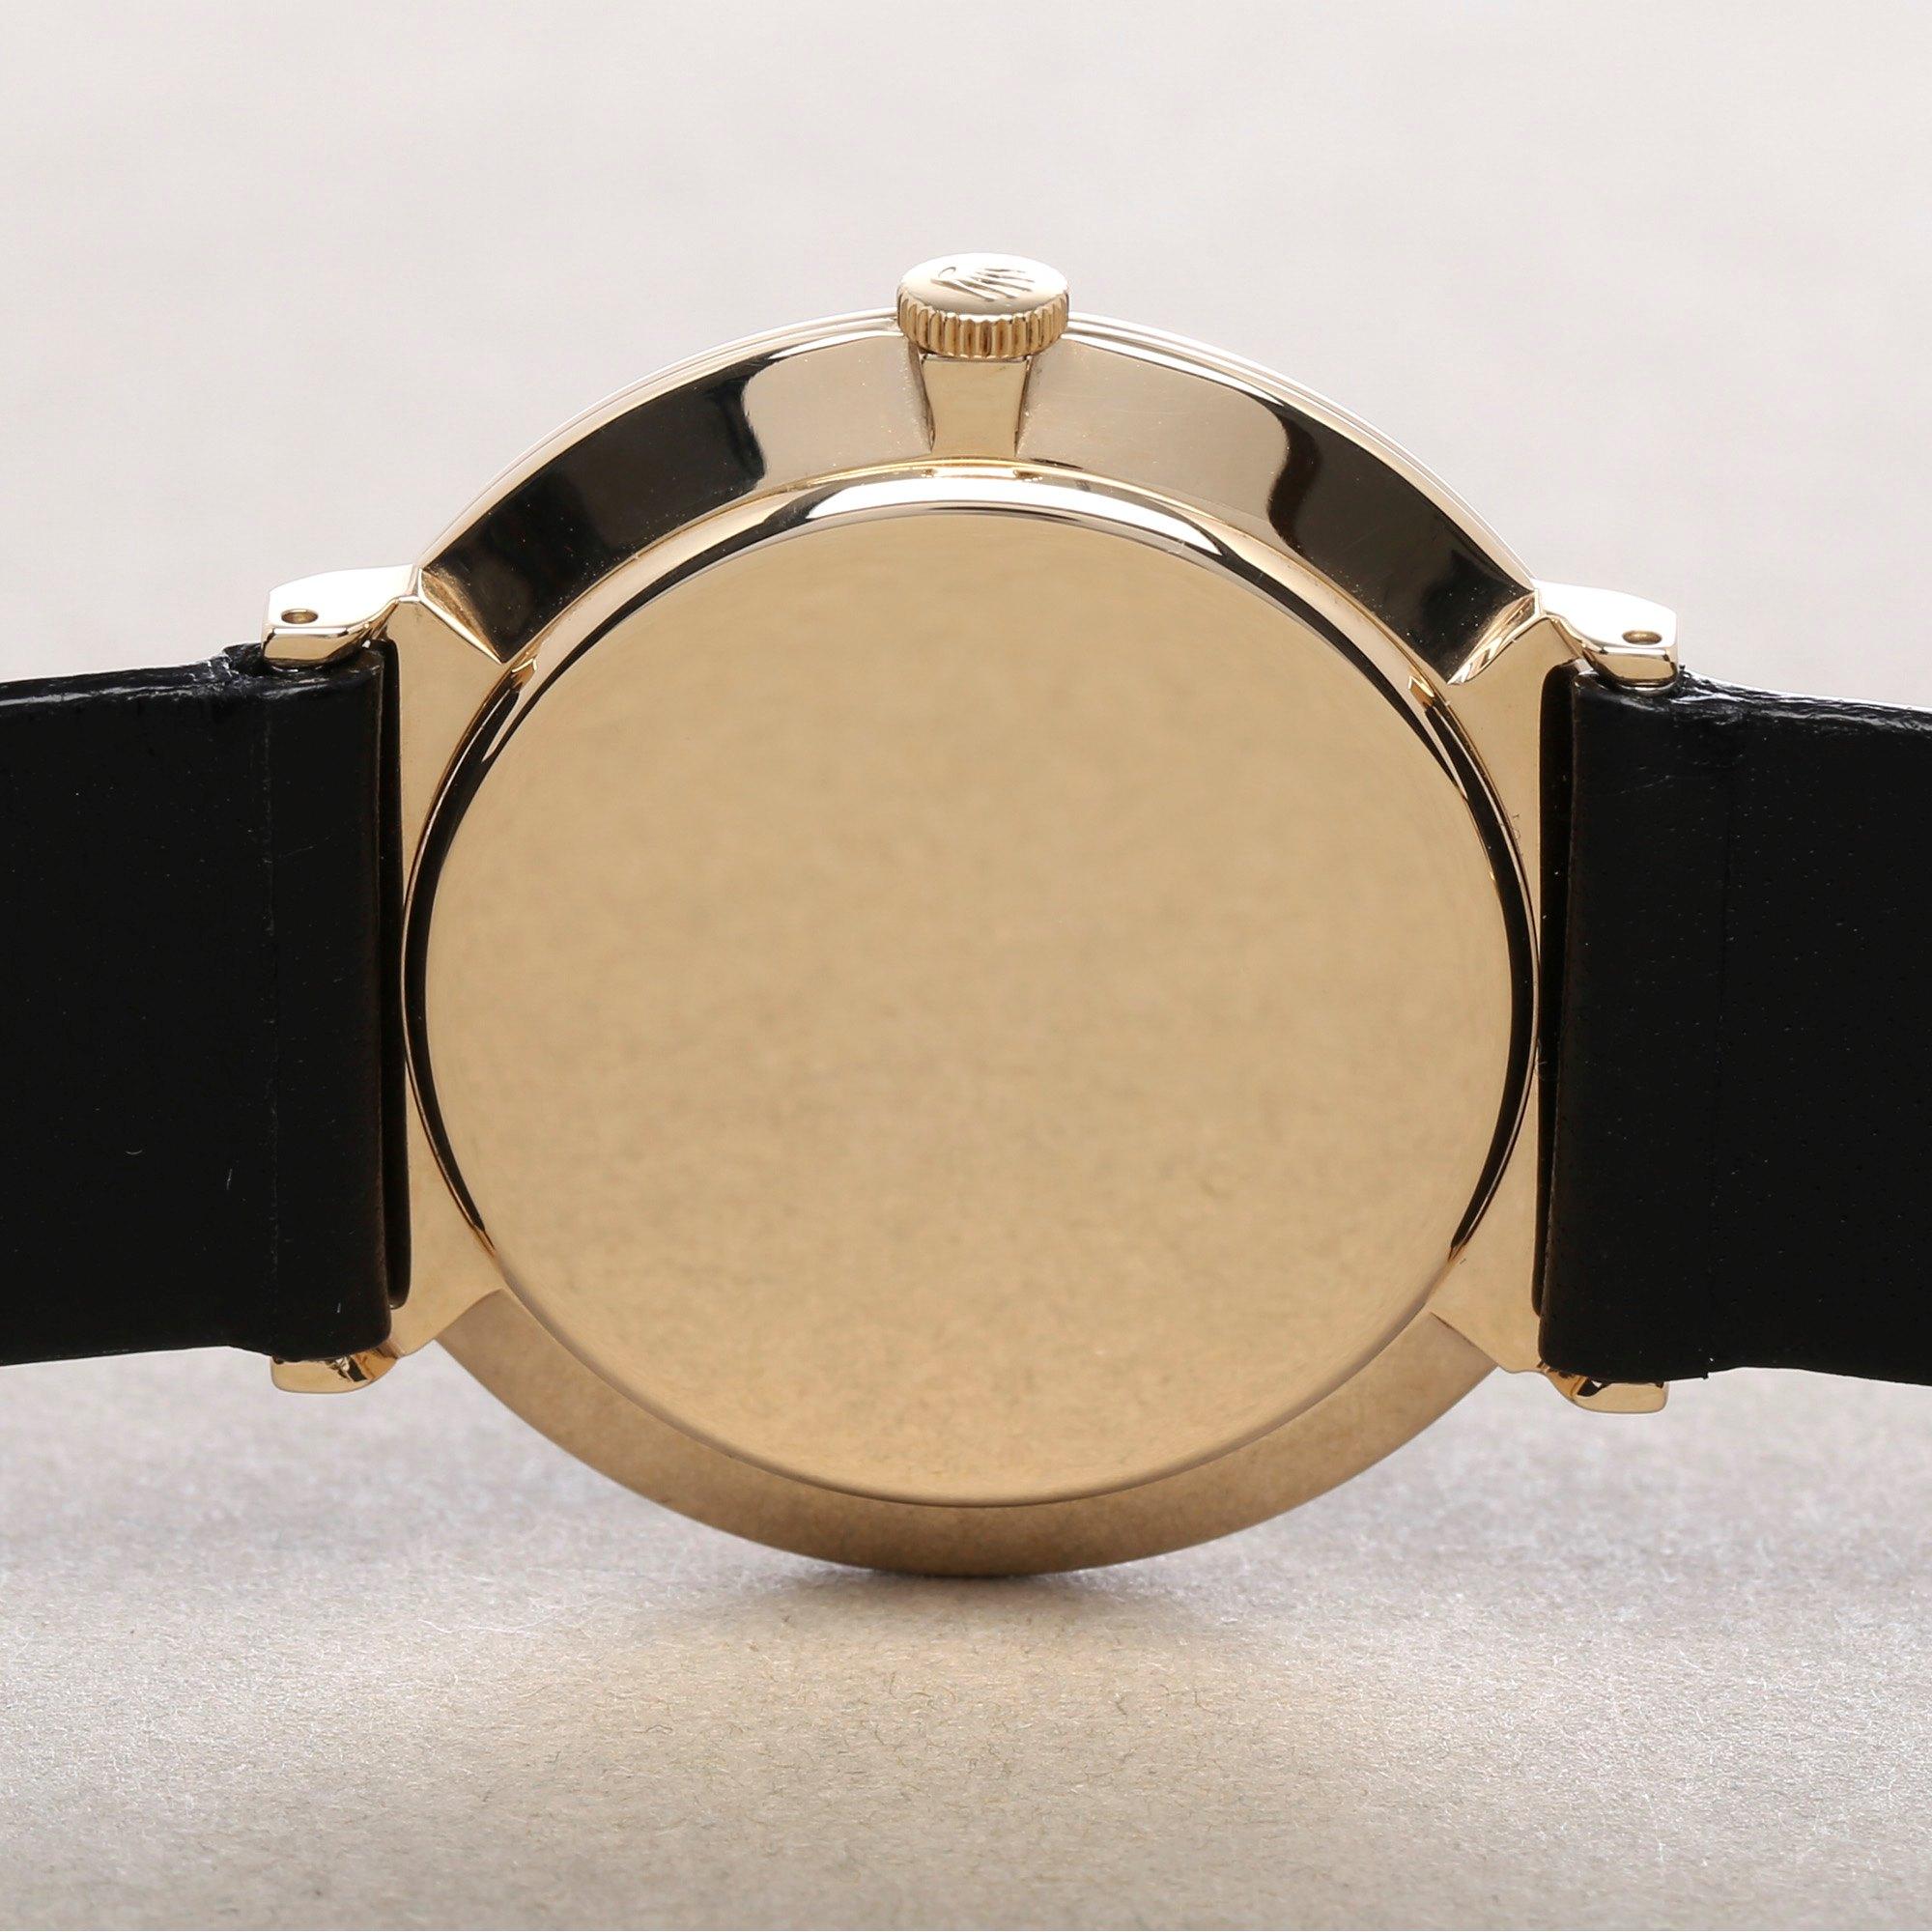 Rolex Precision 9K Yellow Gold 1200